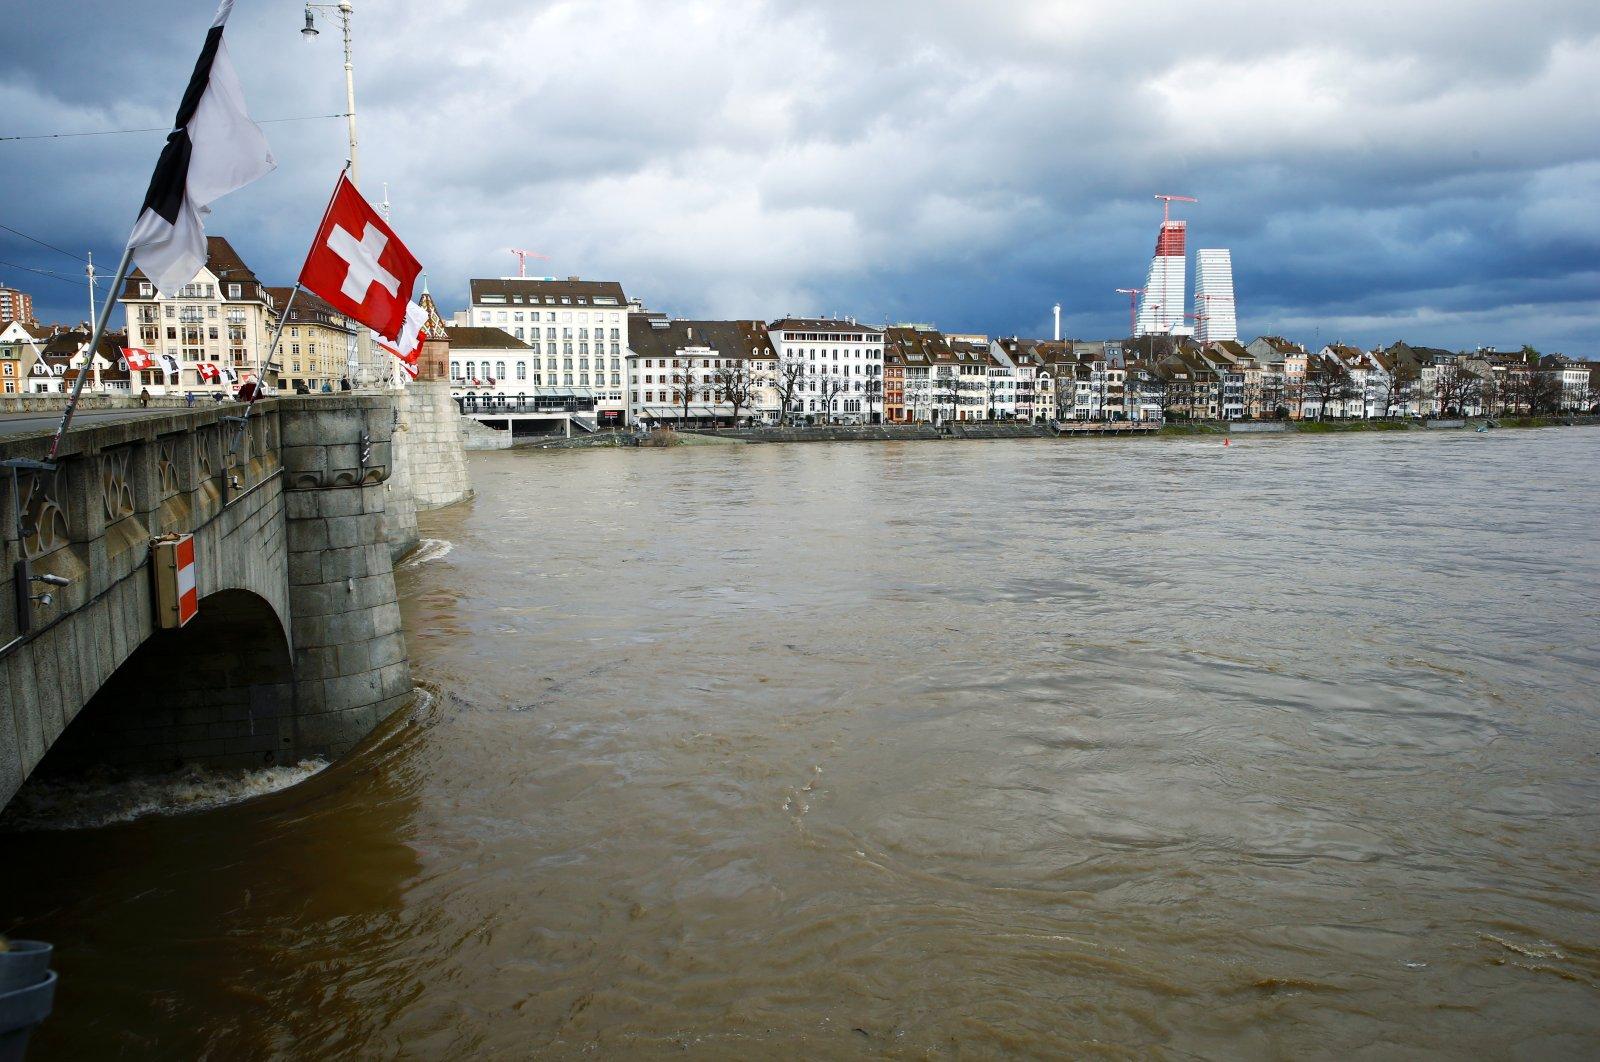 A bridge over the Rhine River in Basel, Switzerland, Jan. 29, 2021. (Reuters Photo)